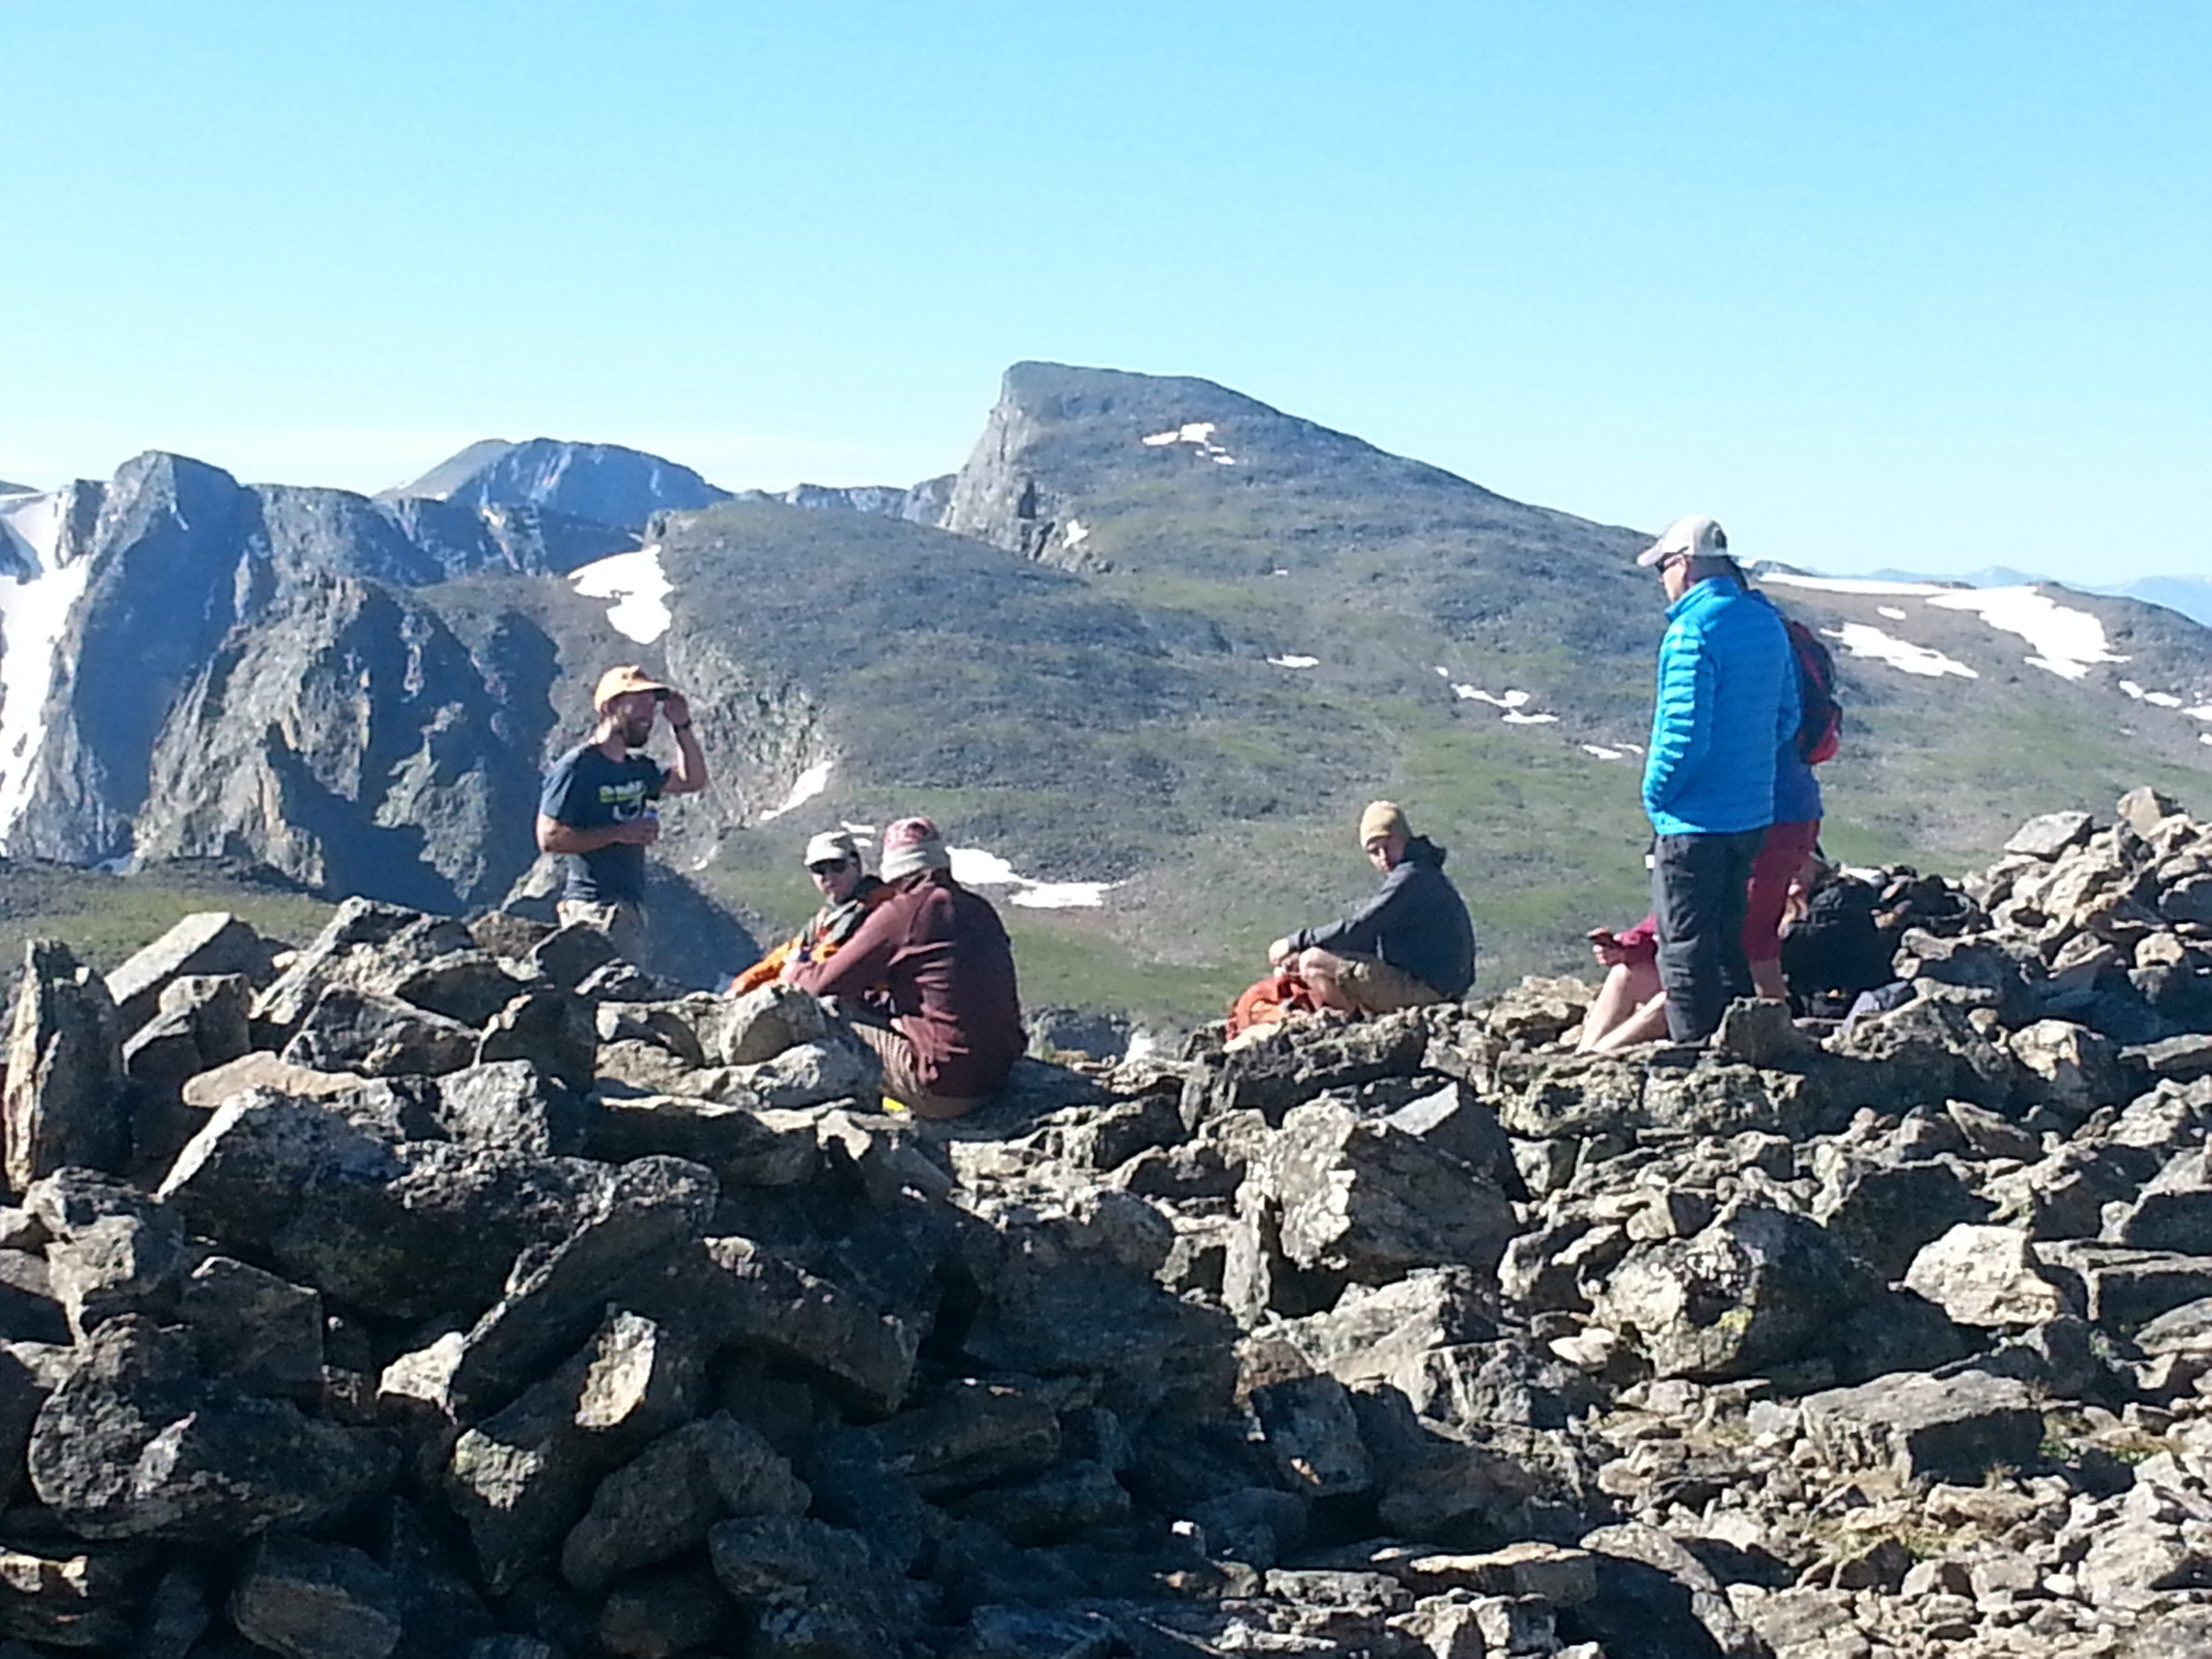 Hallets Peak Hikers Chilling Out.jpg